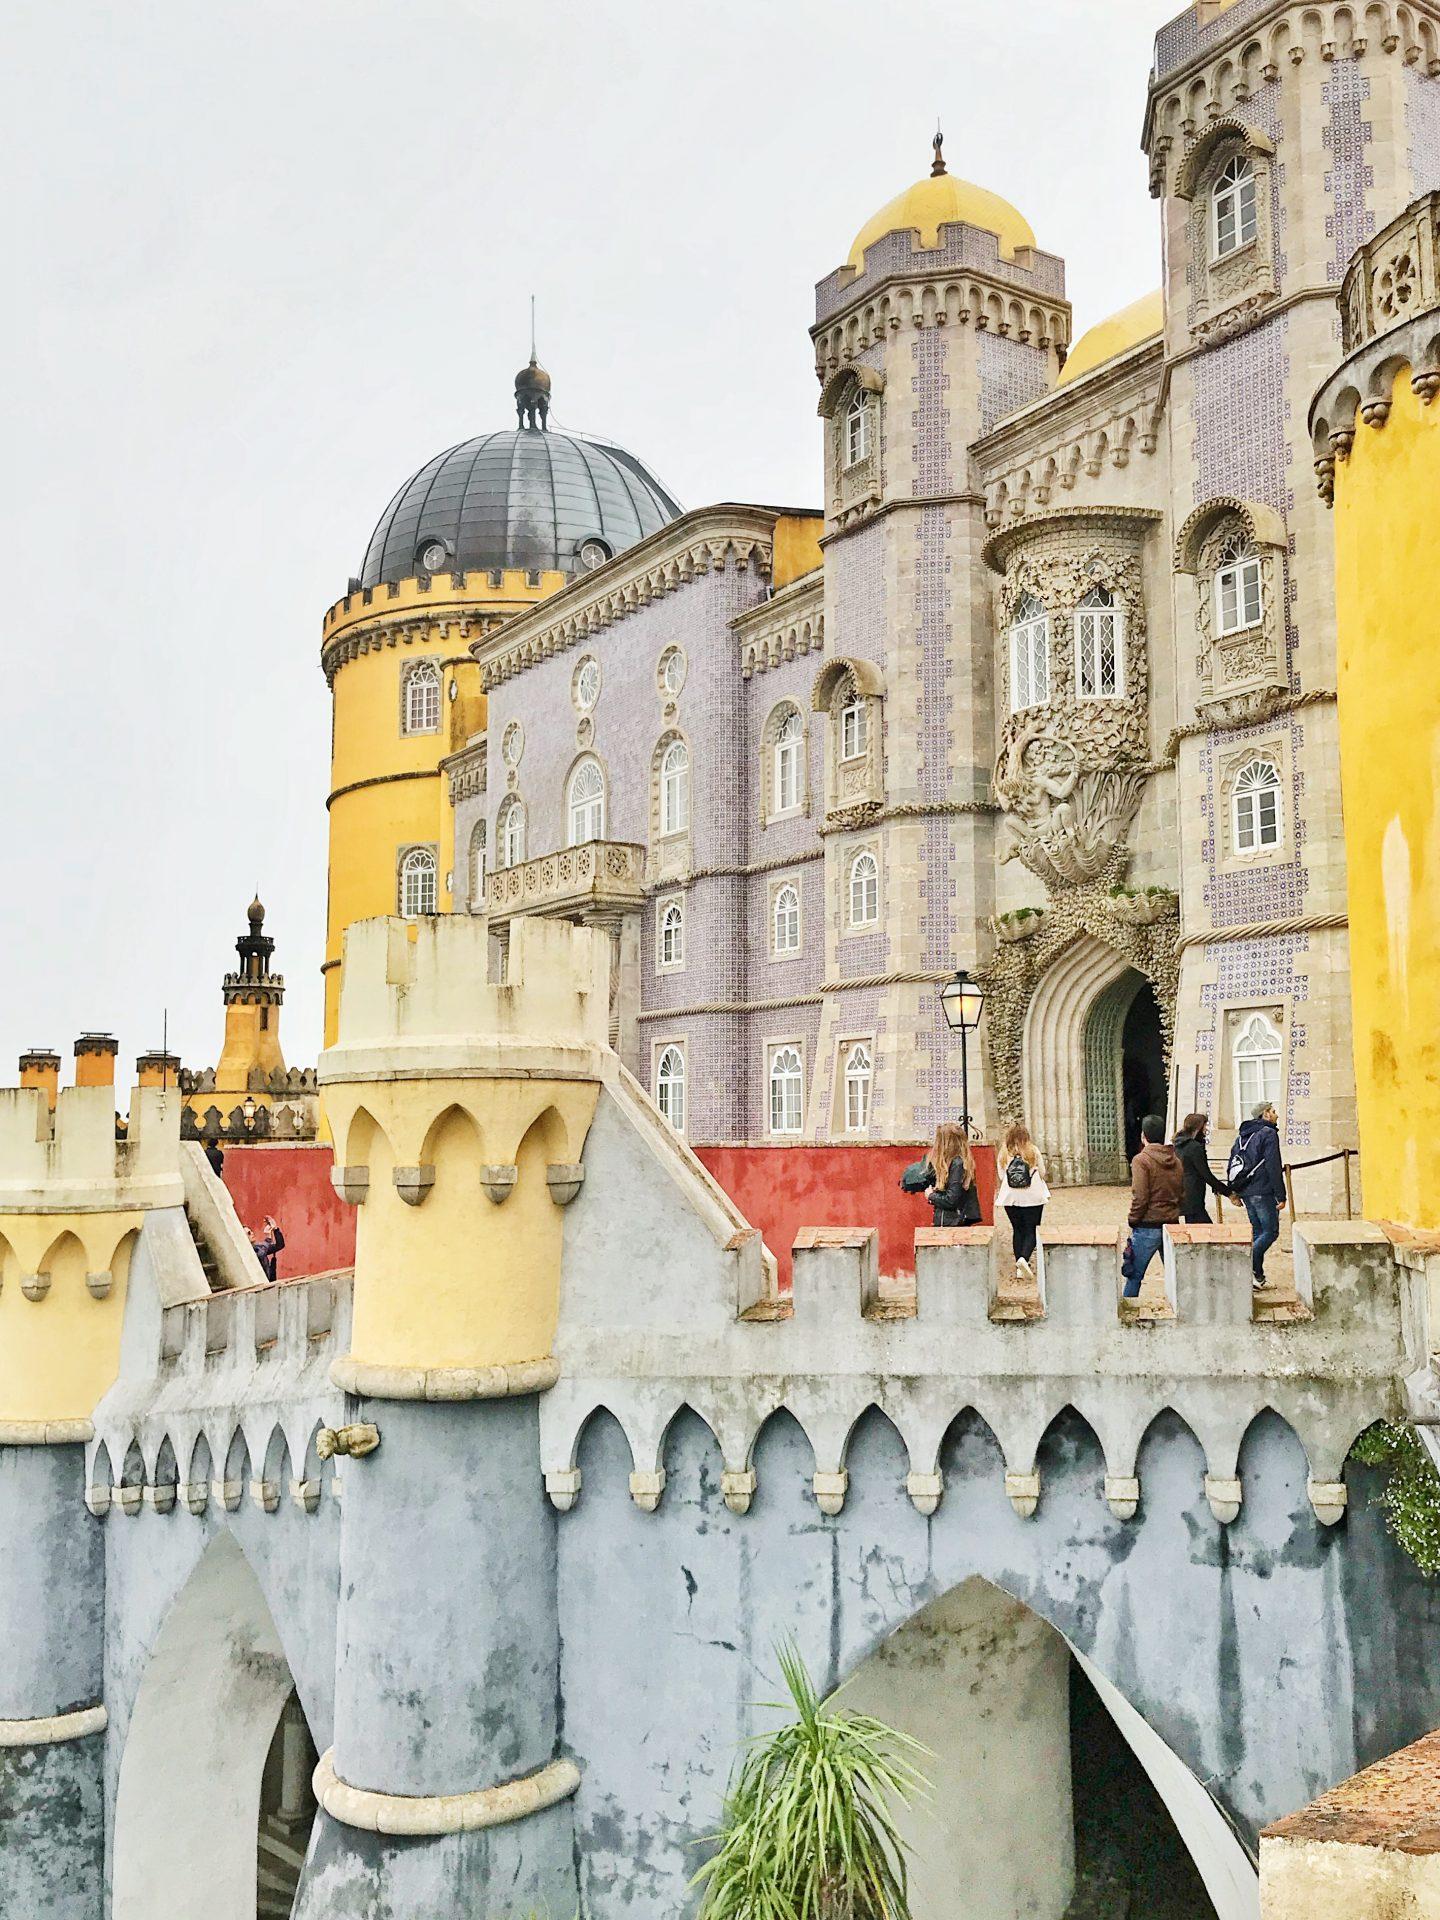 A Day trip to Sintra